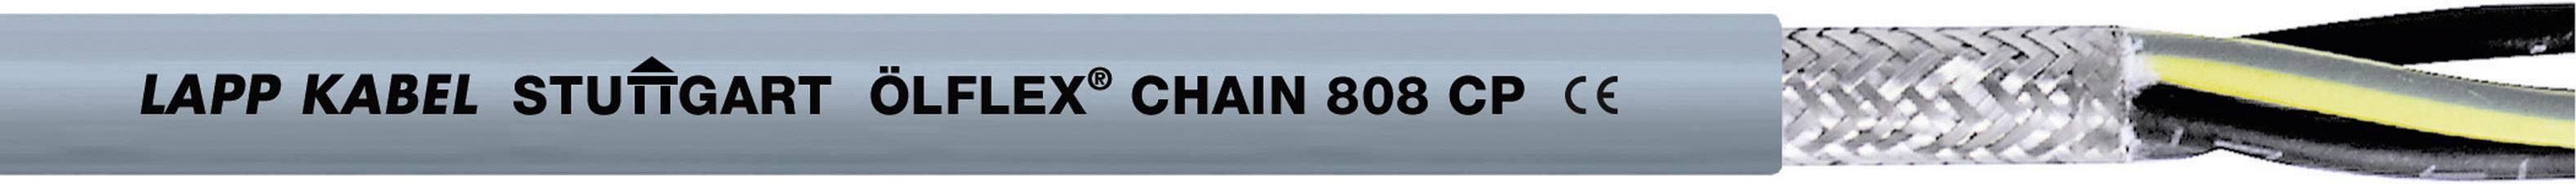 Žíla kabelu LappKabel ÖLFLEX CHAIN 808 CP 4G1,0 (1027769), 4x 1 mm², polyurethan, Ø 7,5 mm, stíněný, 100 m, še